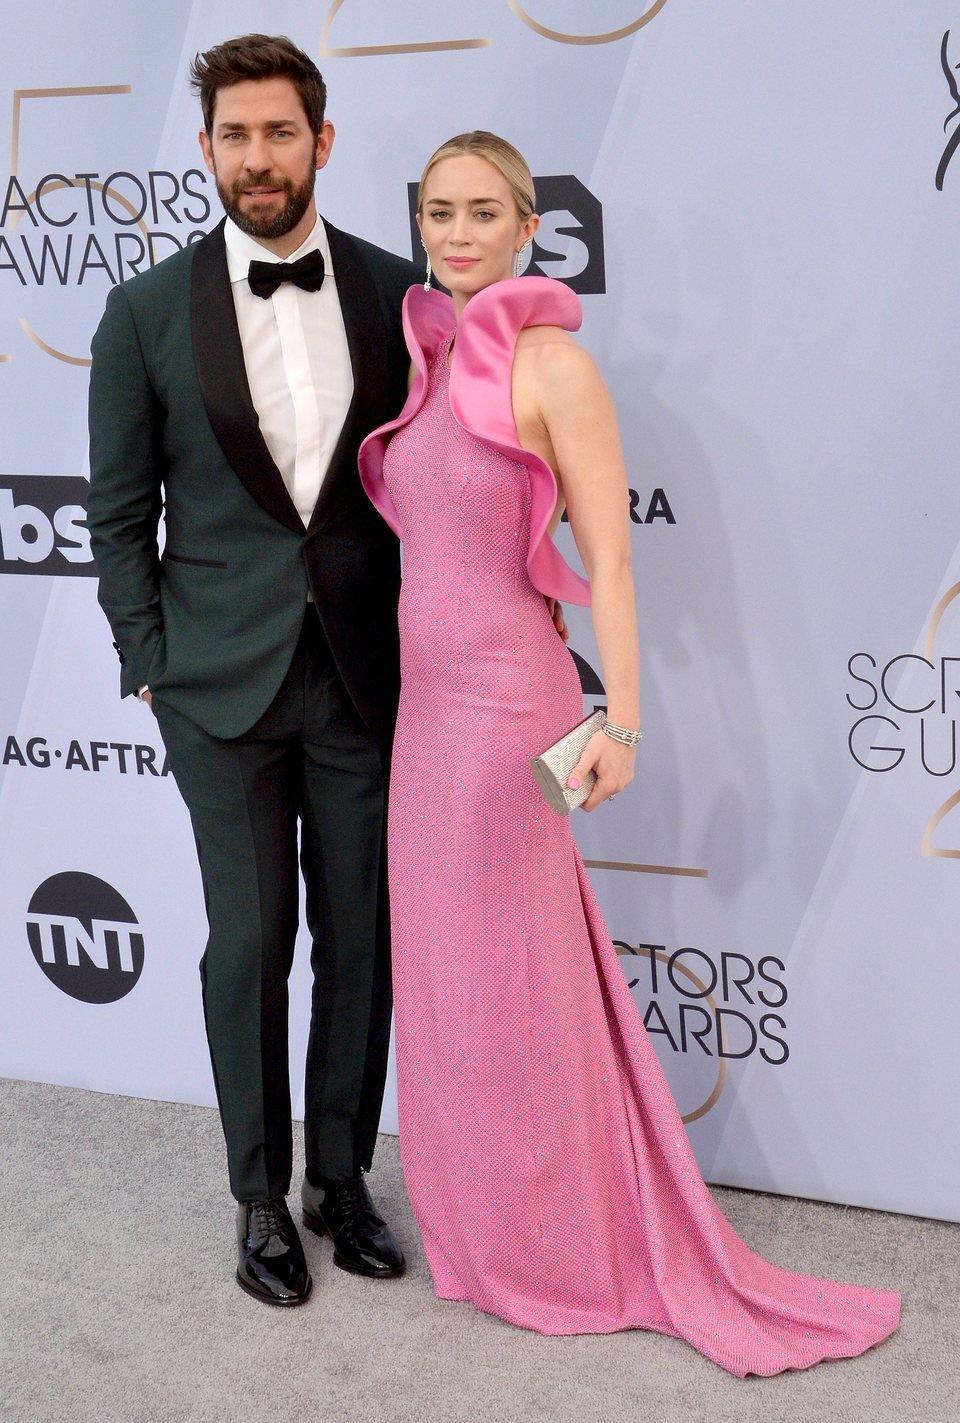 John Krasinski and Emily Blunt at the 2019 SAG Awards